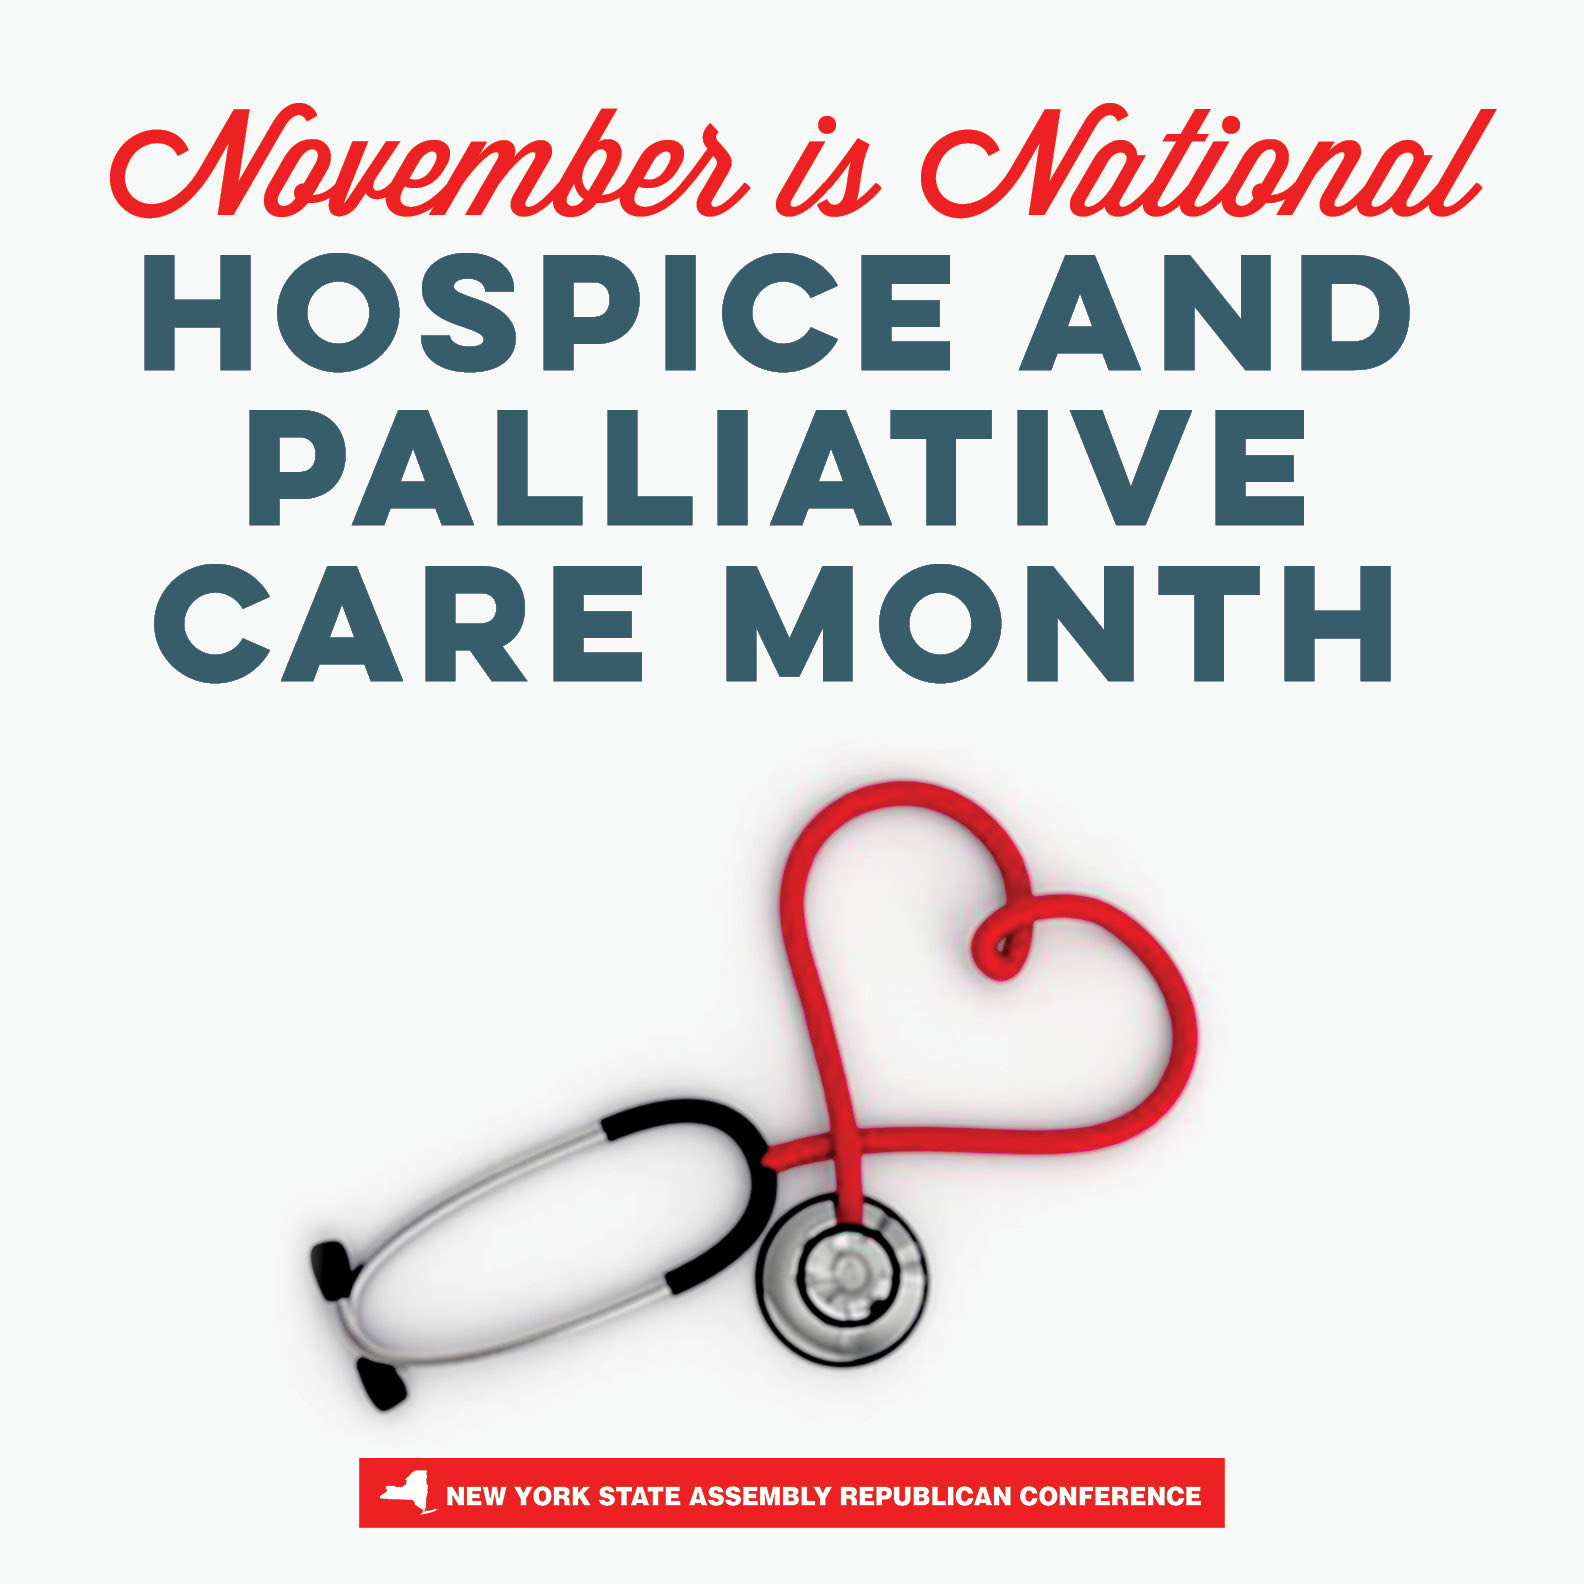 Hospice_Month_11-1-2020.jpg